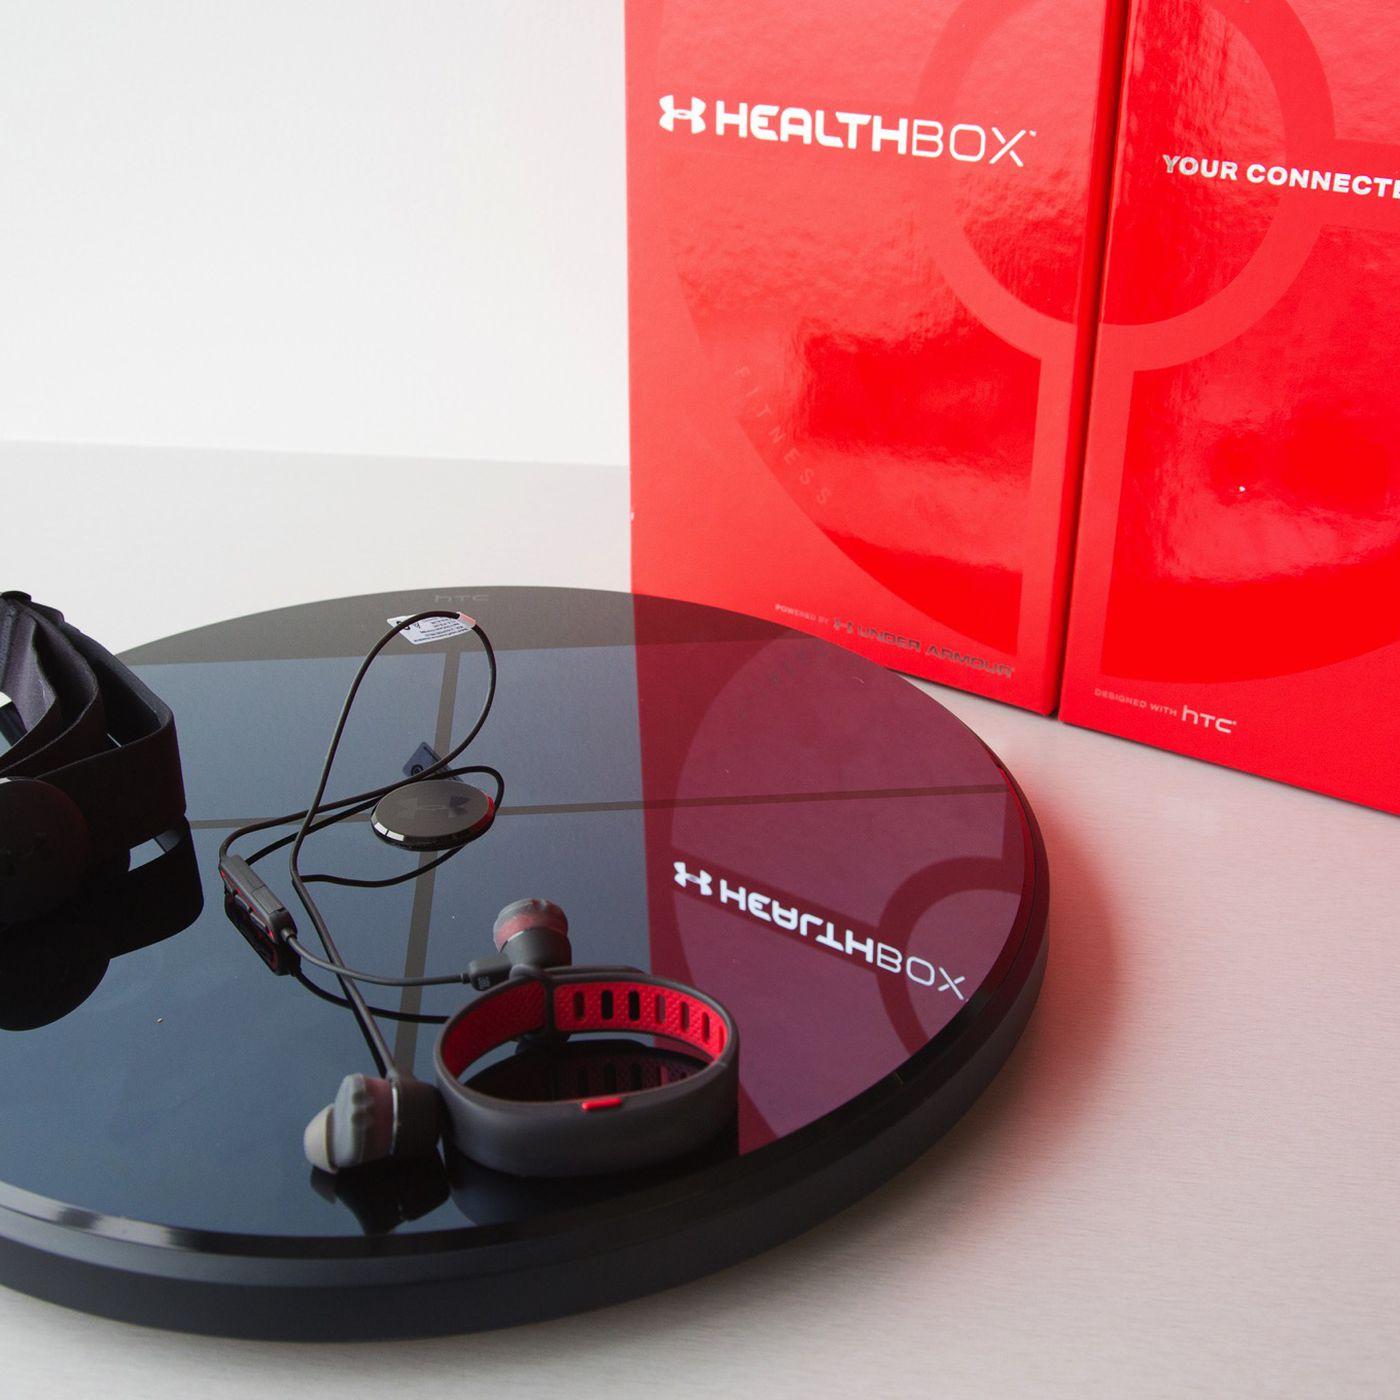 Portal asistencia No haga  Under Armour's connected health gadgets are basically bricked - The Verge